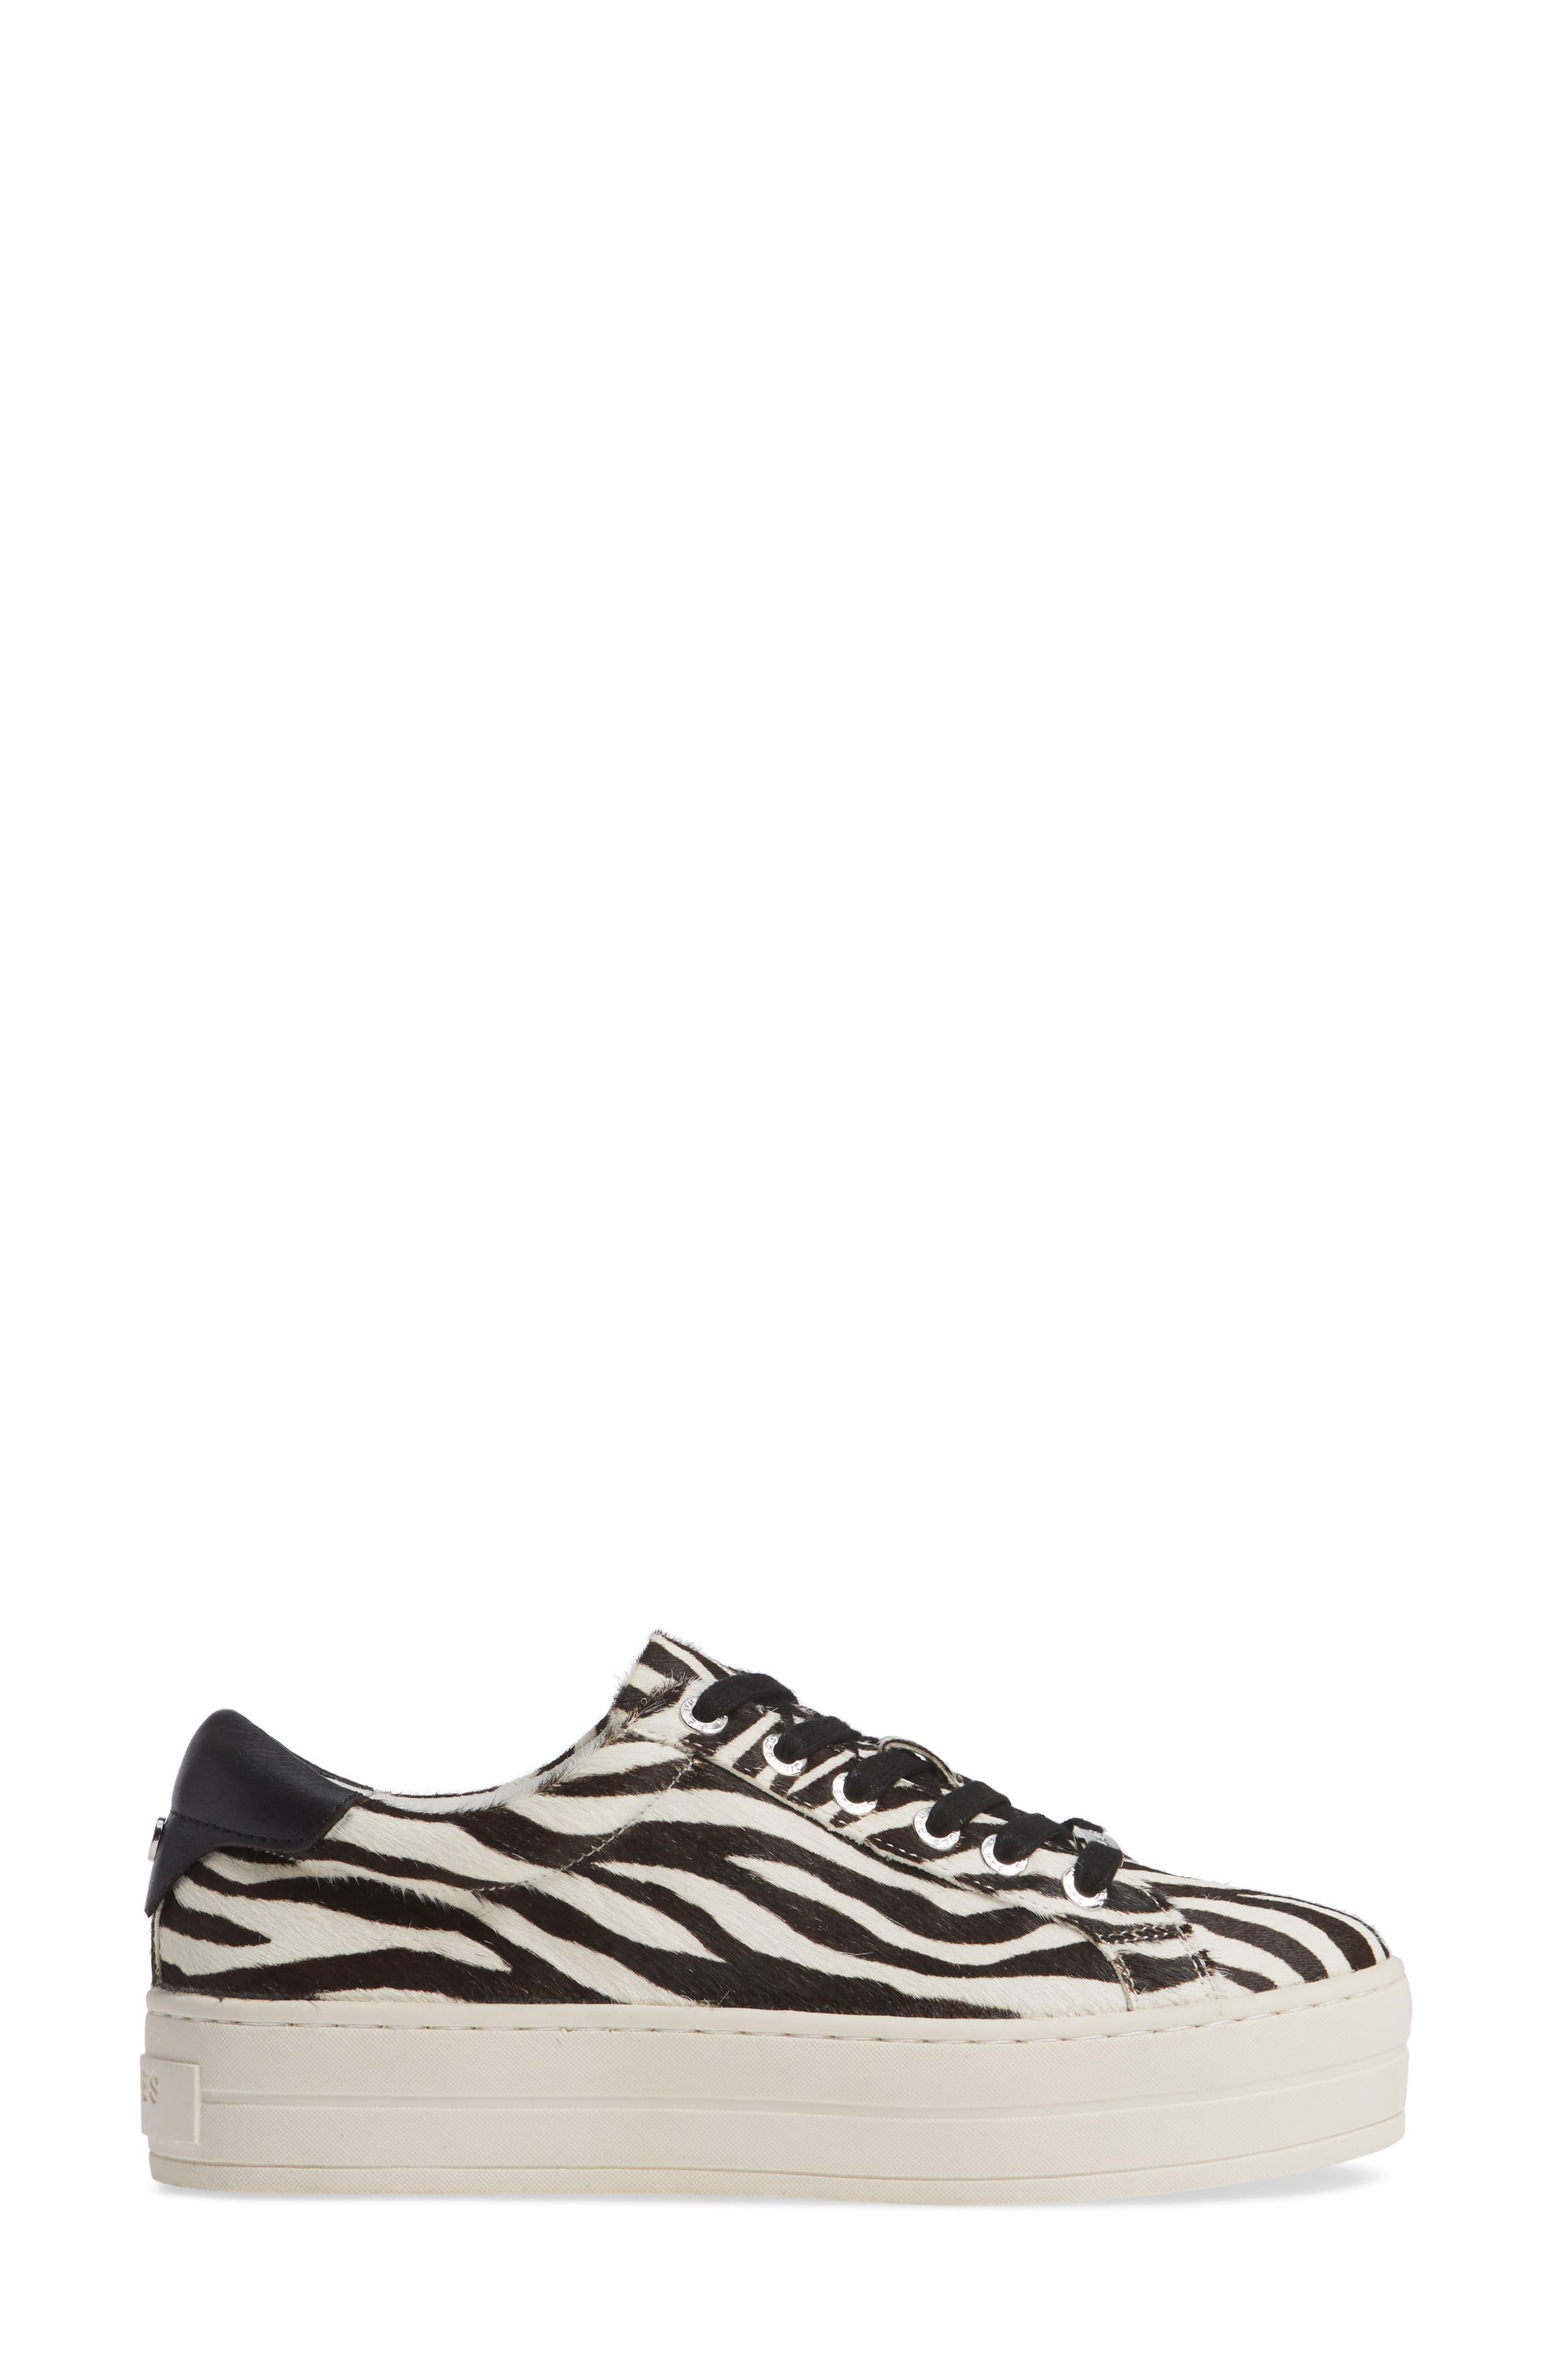 JSLIDES,                             Hippie Genuine Calf Hair Platform Sneaker,                             Alternate thumbnail 3, color,                             ZEBRA CALF HAIR